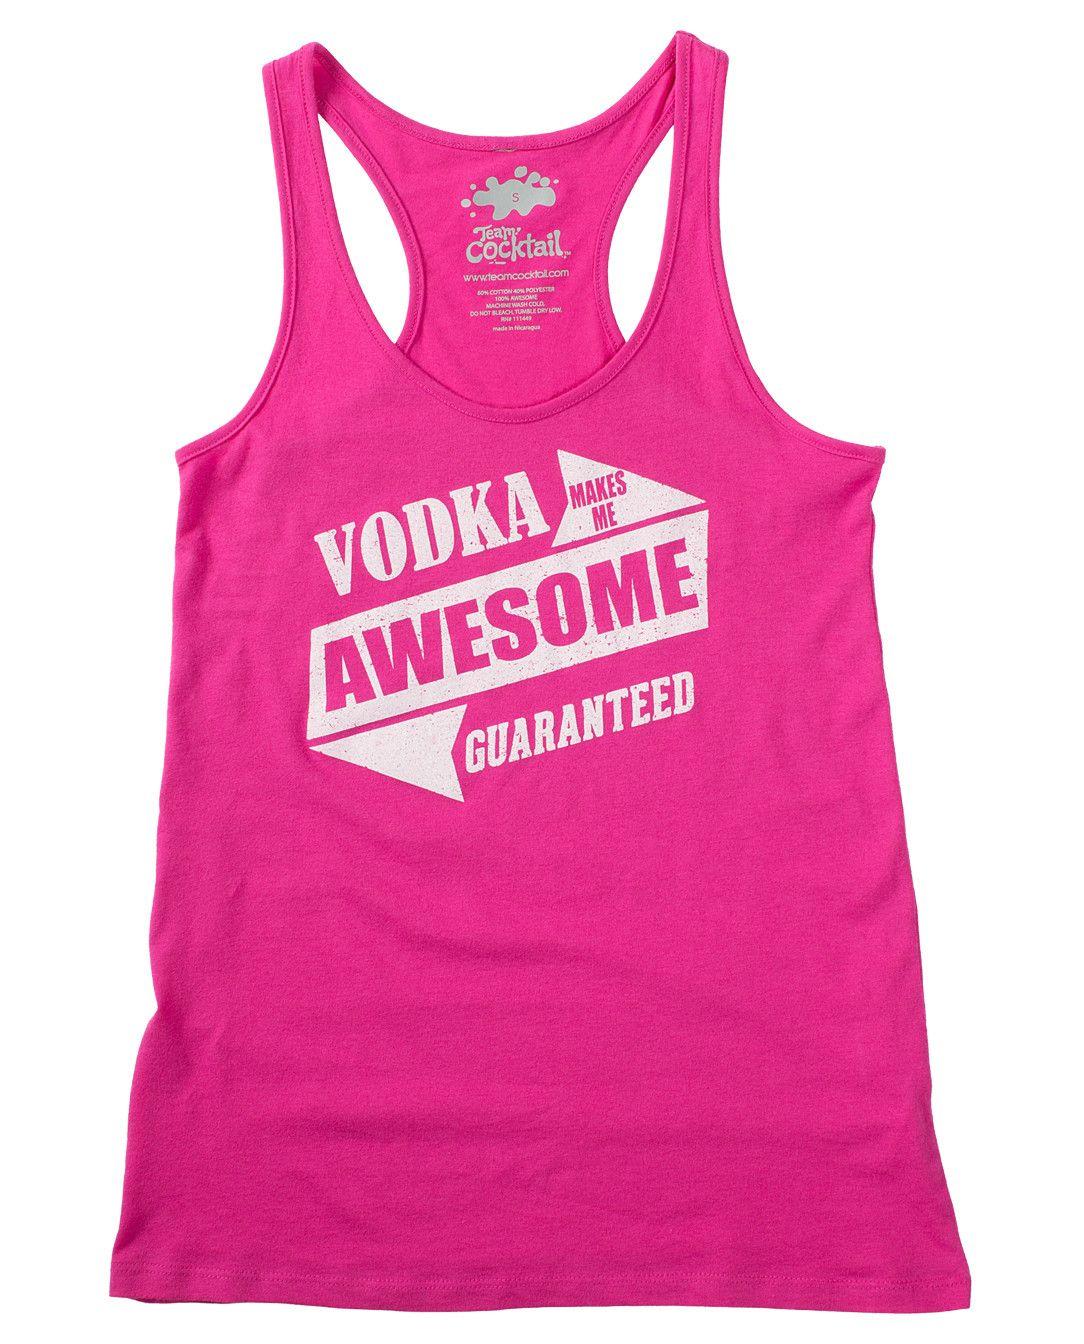 LEMON DROP BAR Cocktail Womens White TANK TOP Tee T-Shirt Bar Drink Wear Uniform